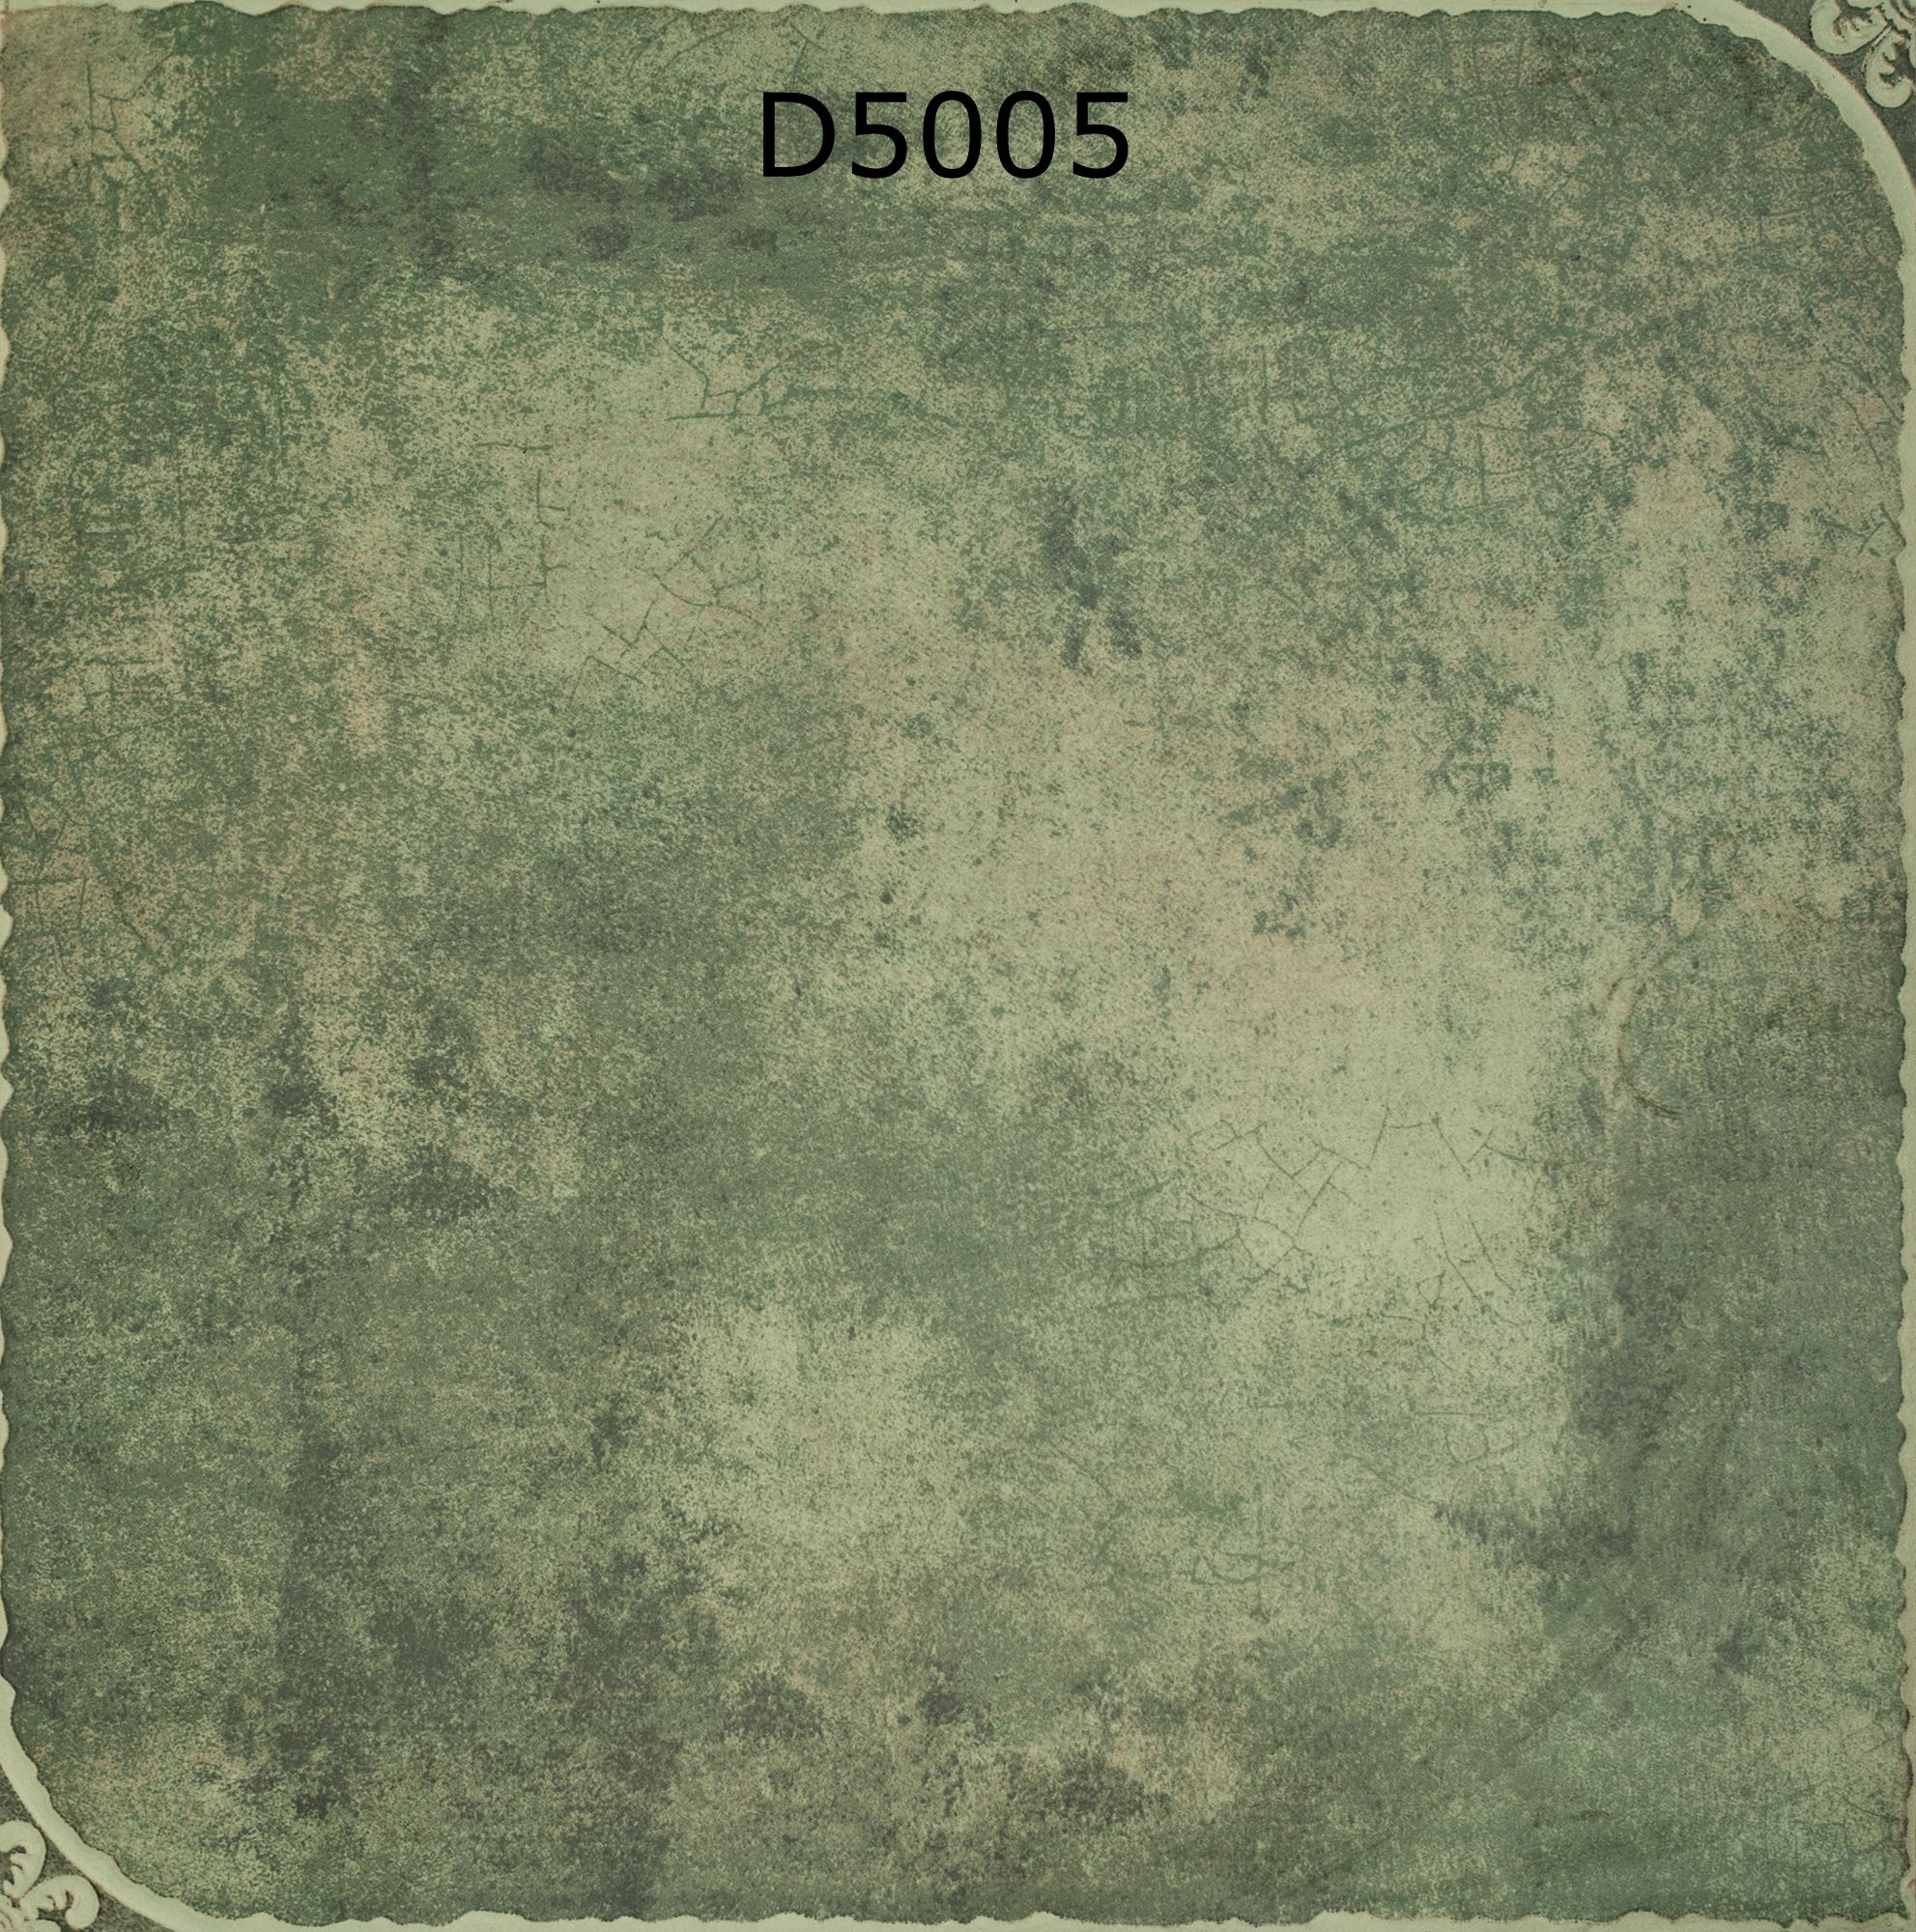 D5005